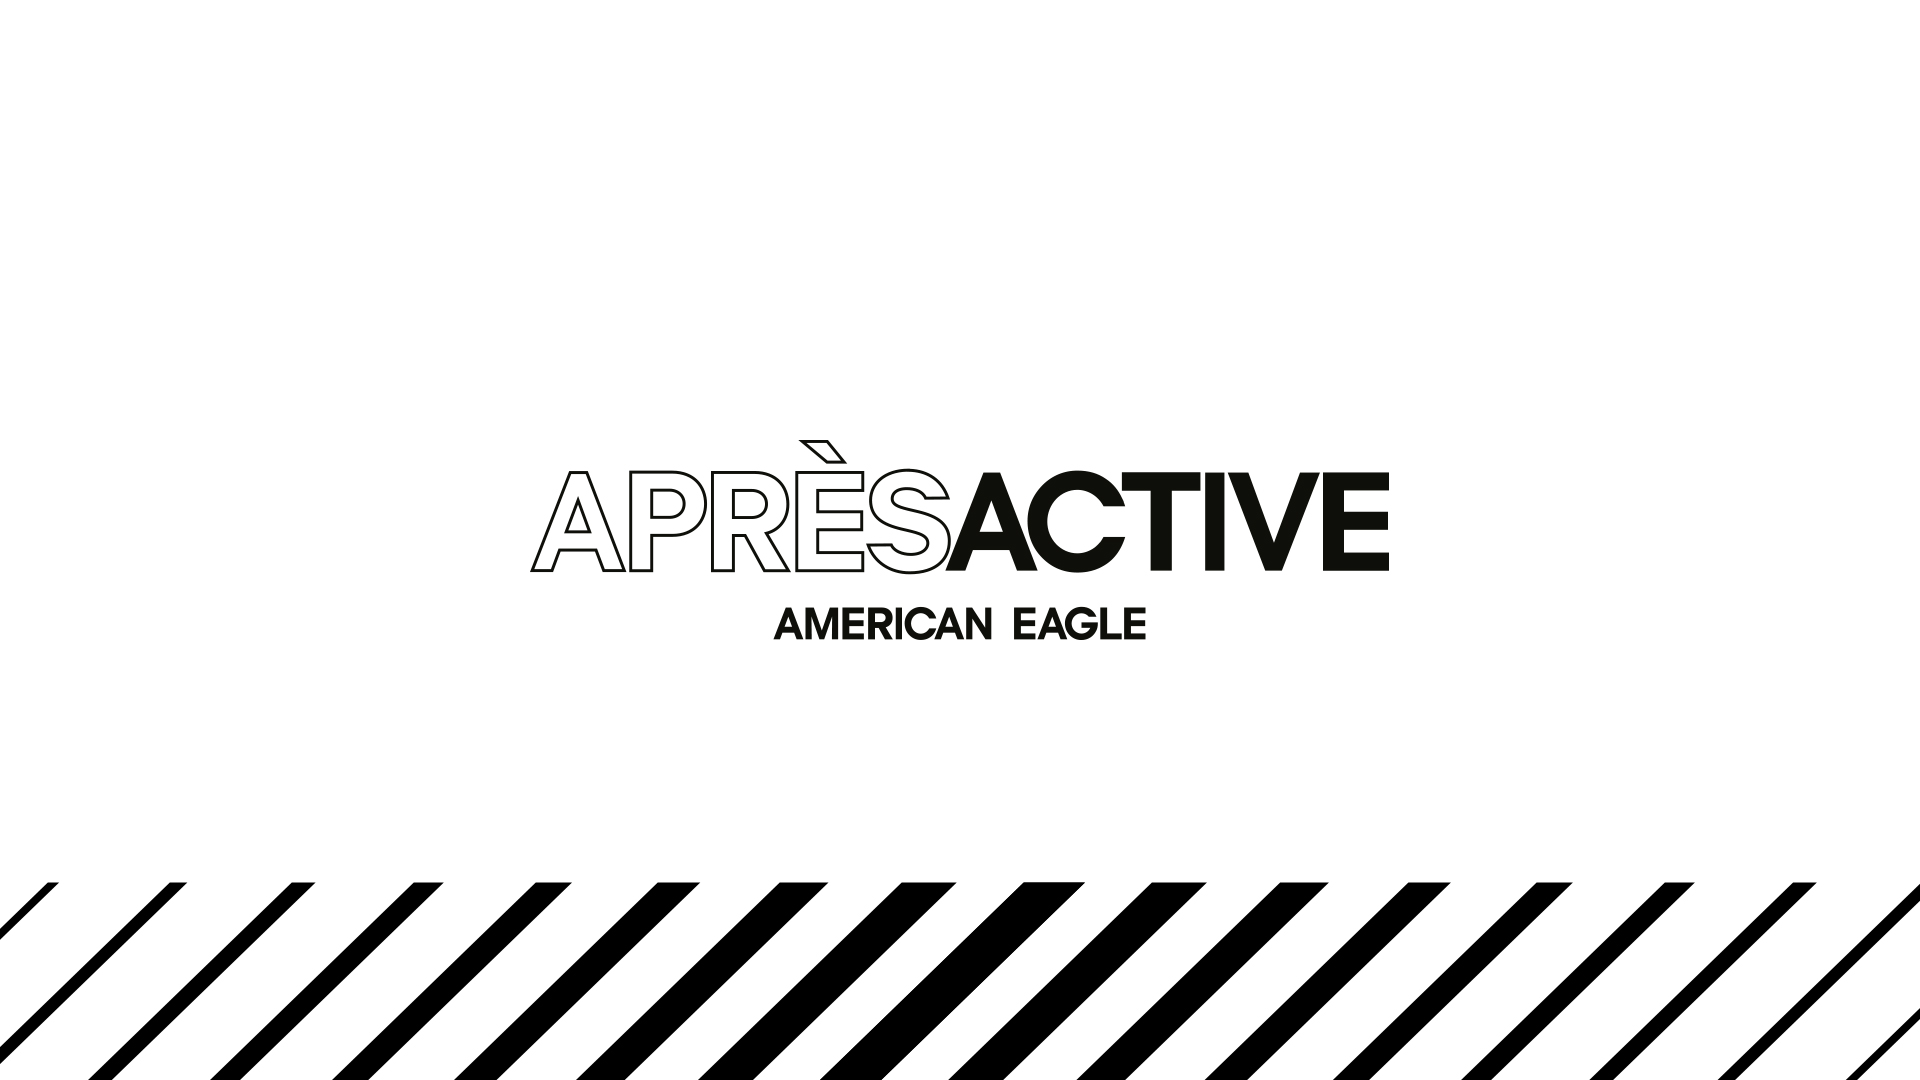 AE_APRES_HEADER